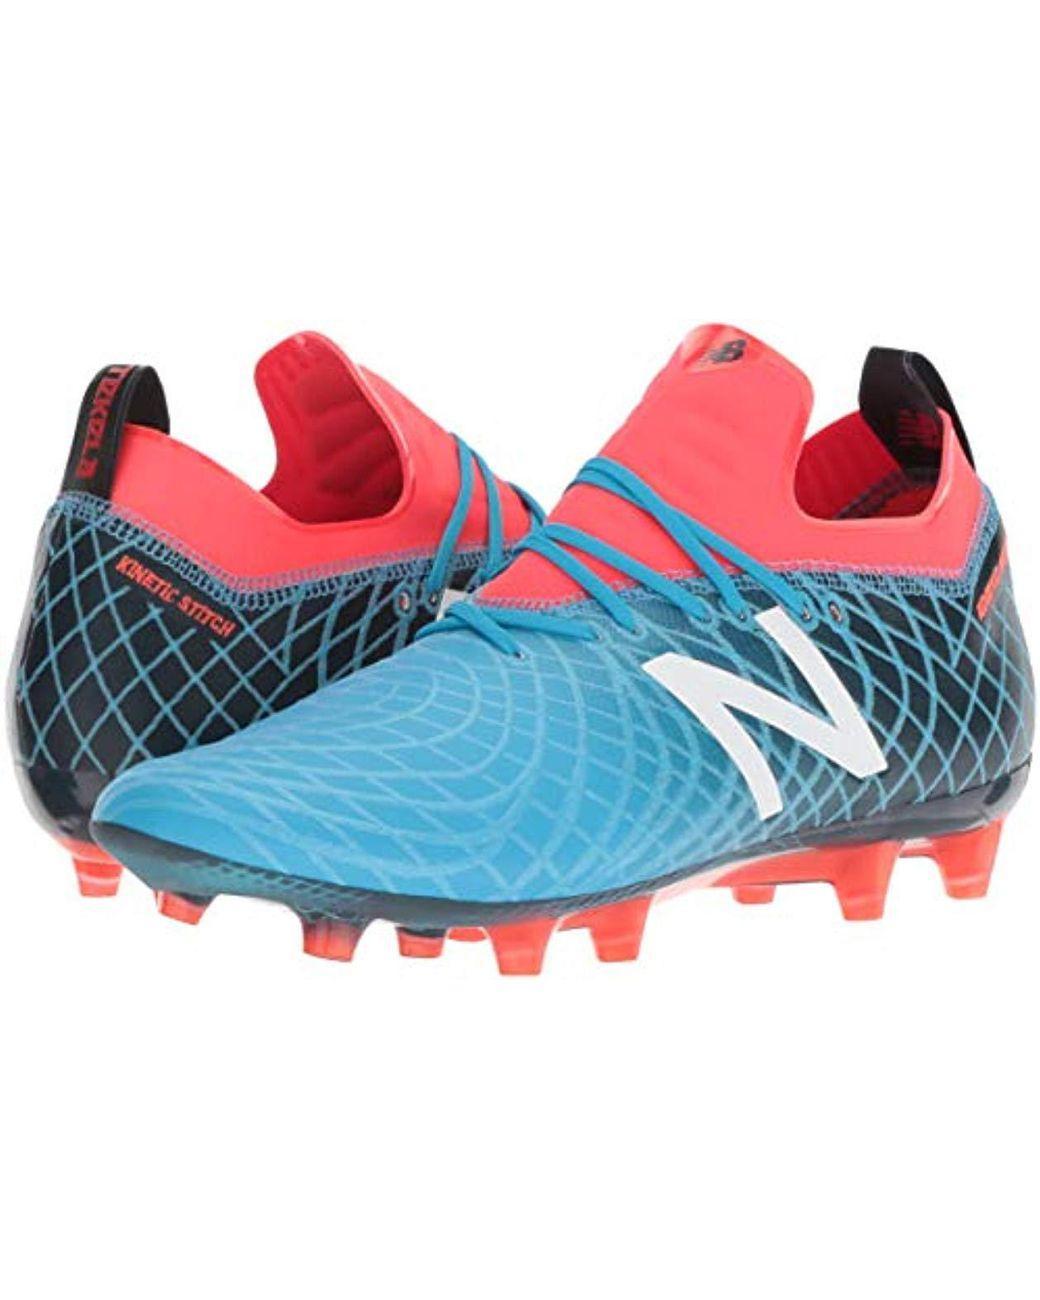 on sale 1eac9 8b067 New Balance Tpf V1 Soccer Shoe in Blue for Men - Save 1% - Lyst